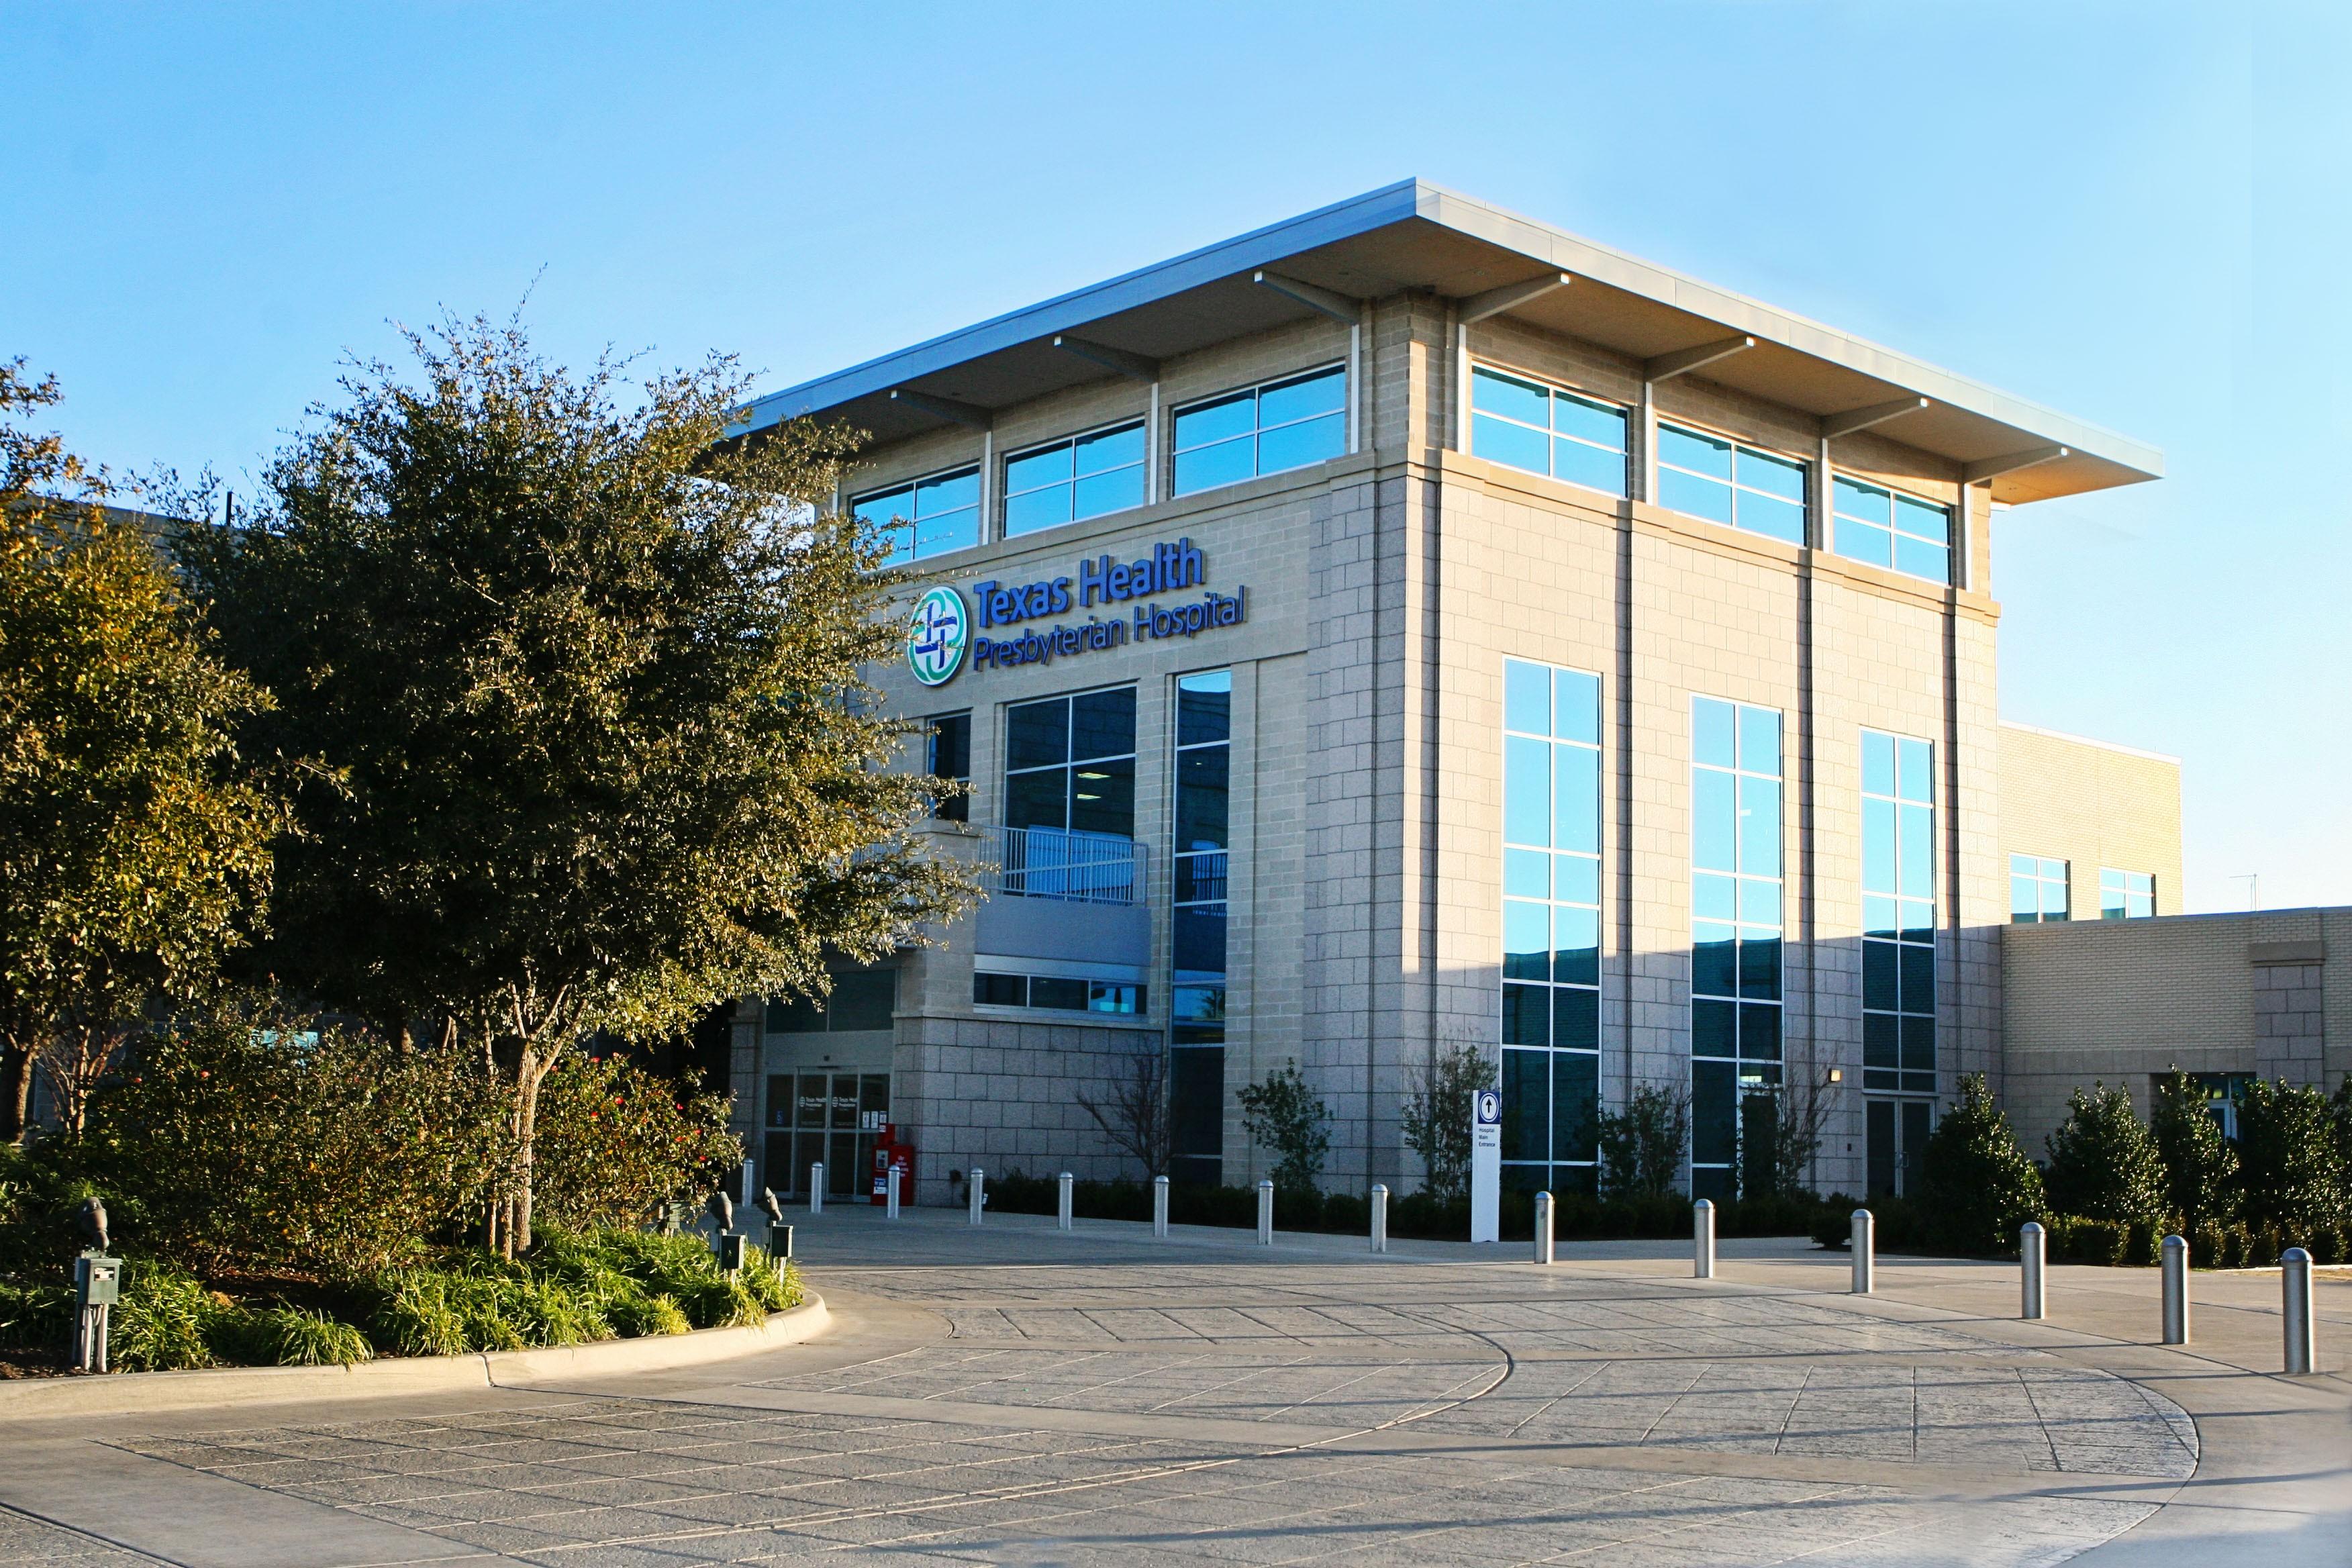 Texas Health Presbyterian Hospital Rockwall | LinkedIn